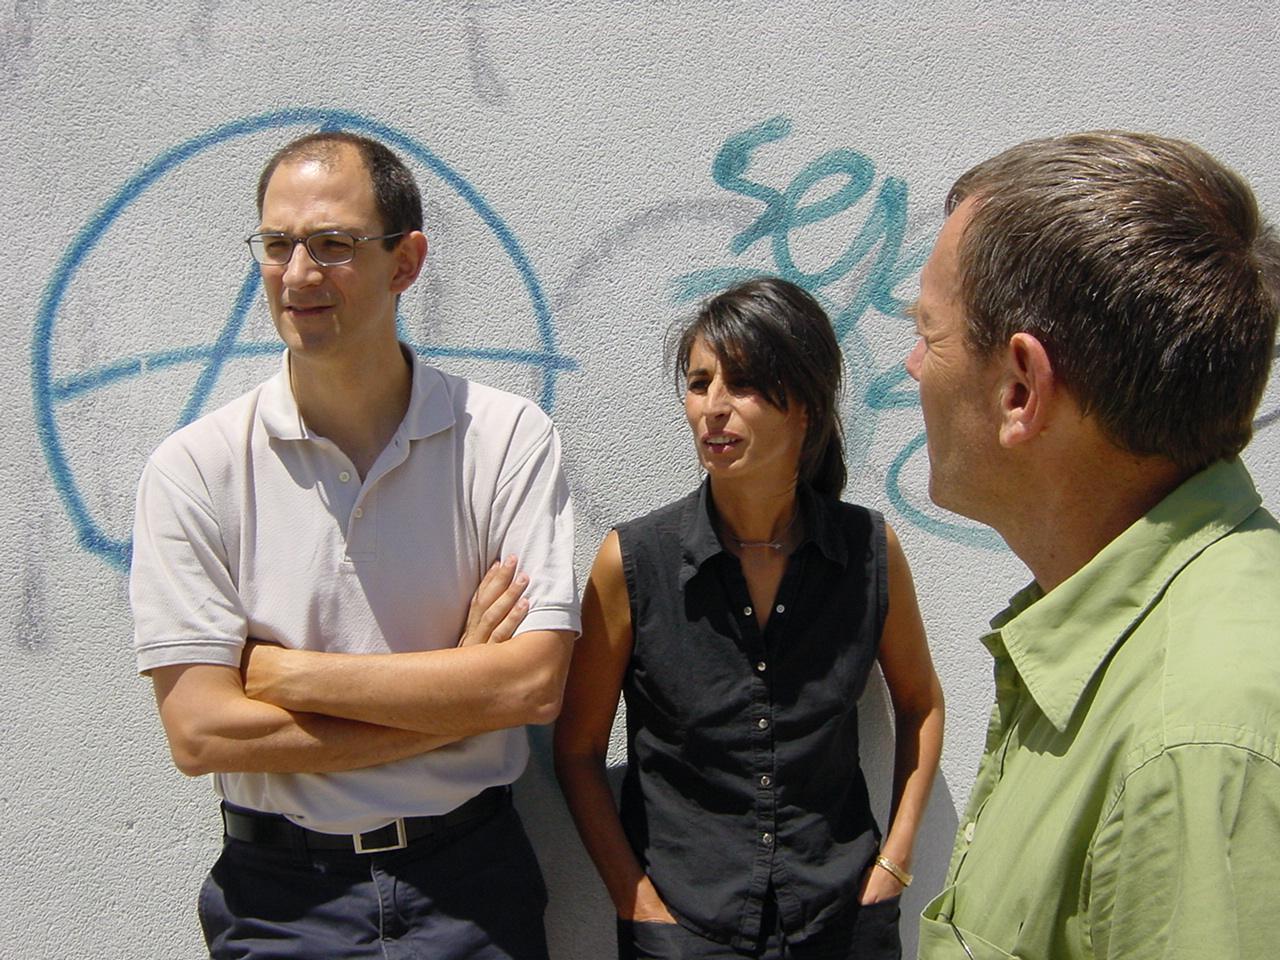 Atxu Amann, Andrés Cánovas and Nicolás Maruri